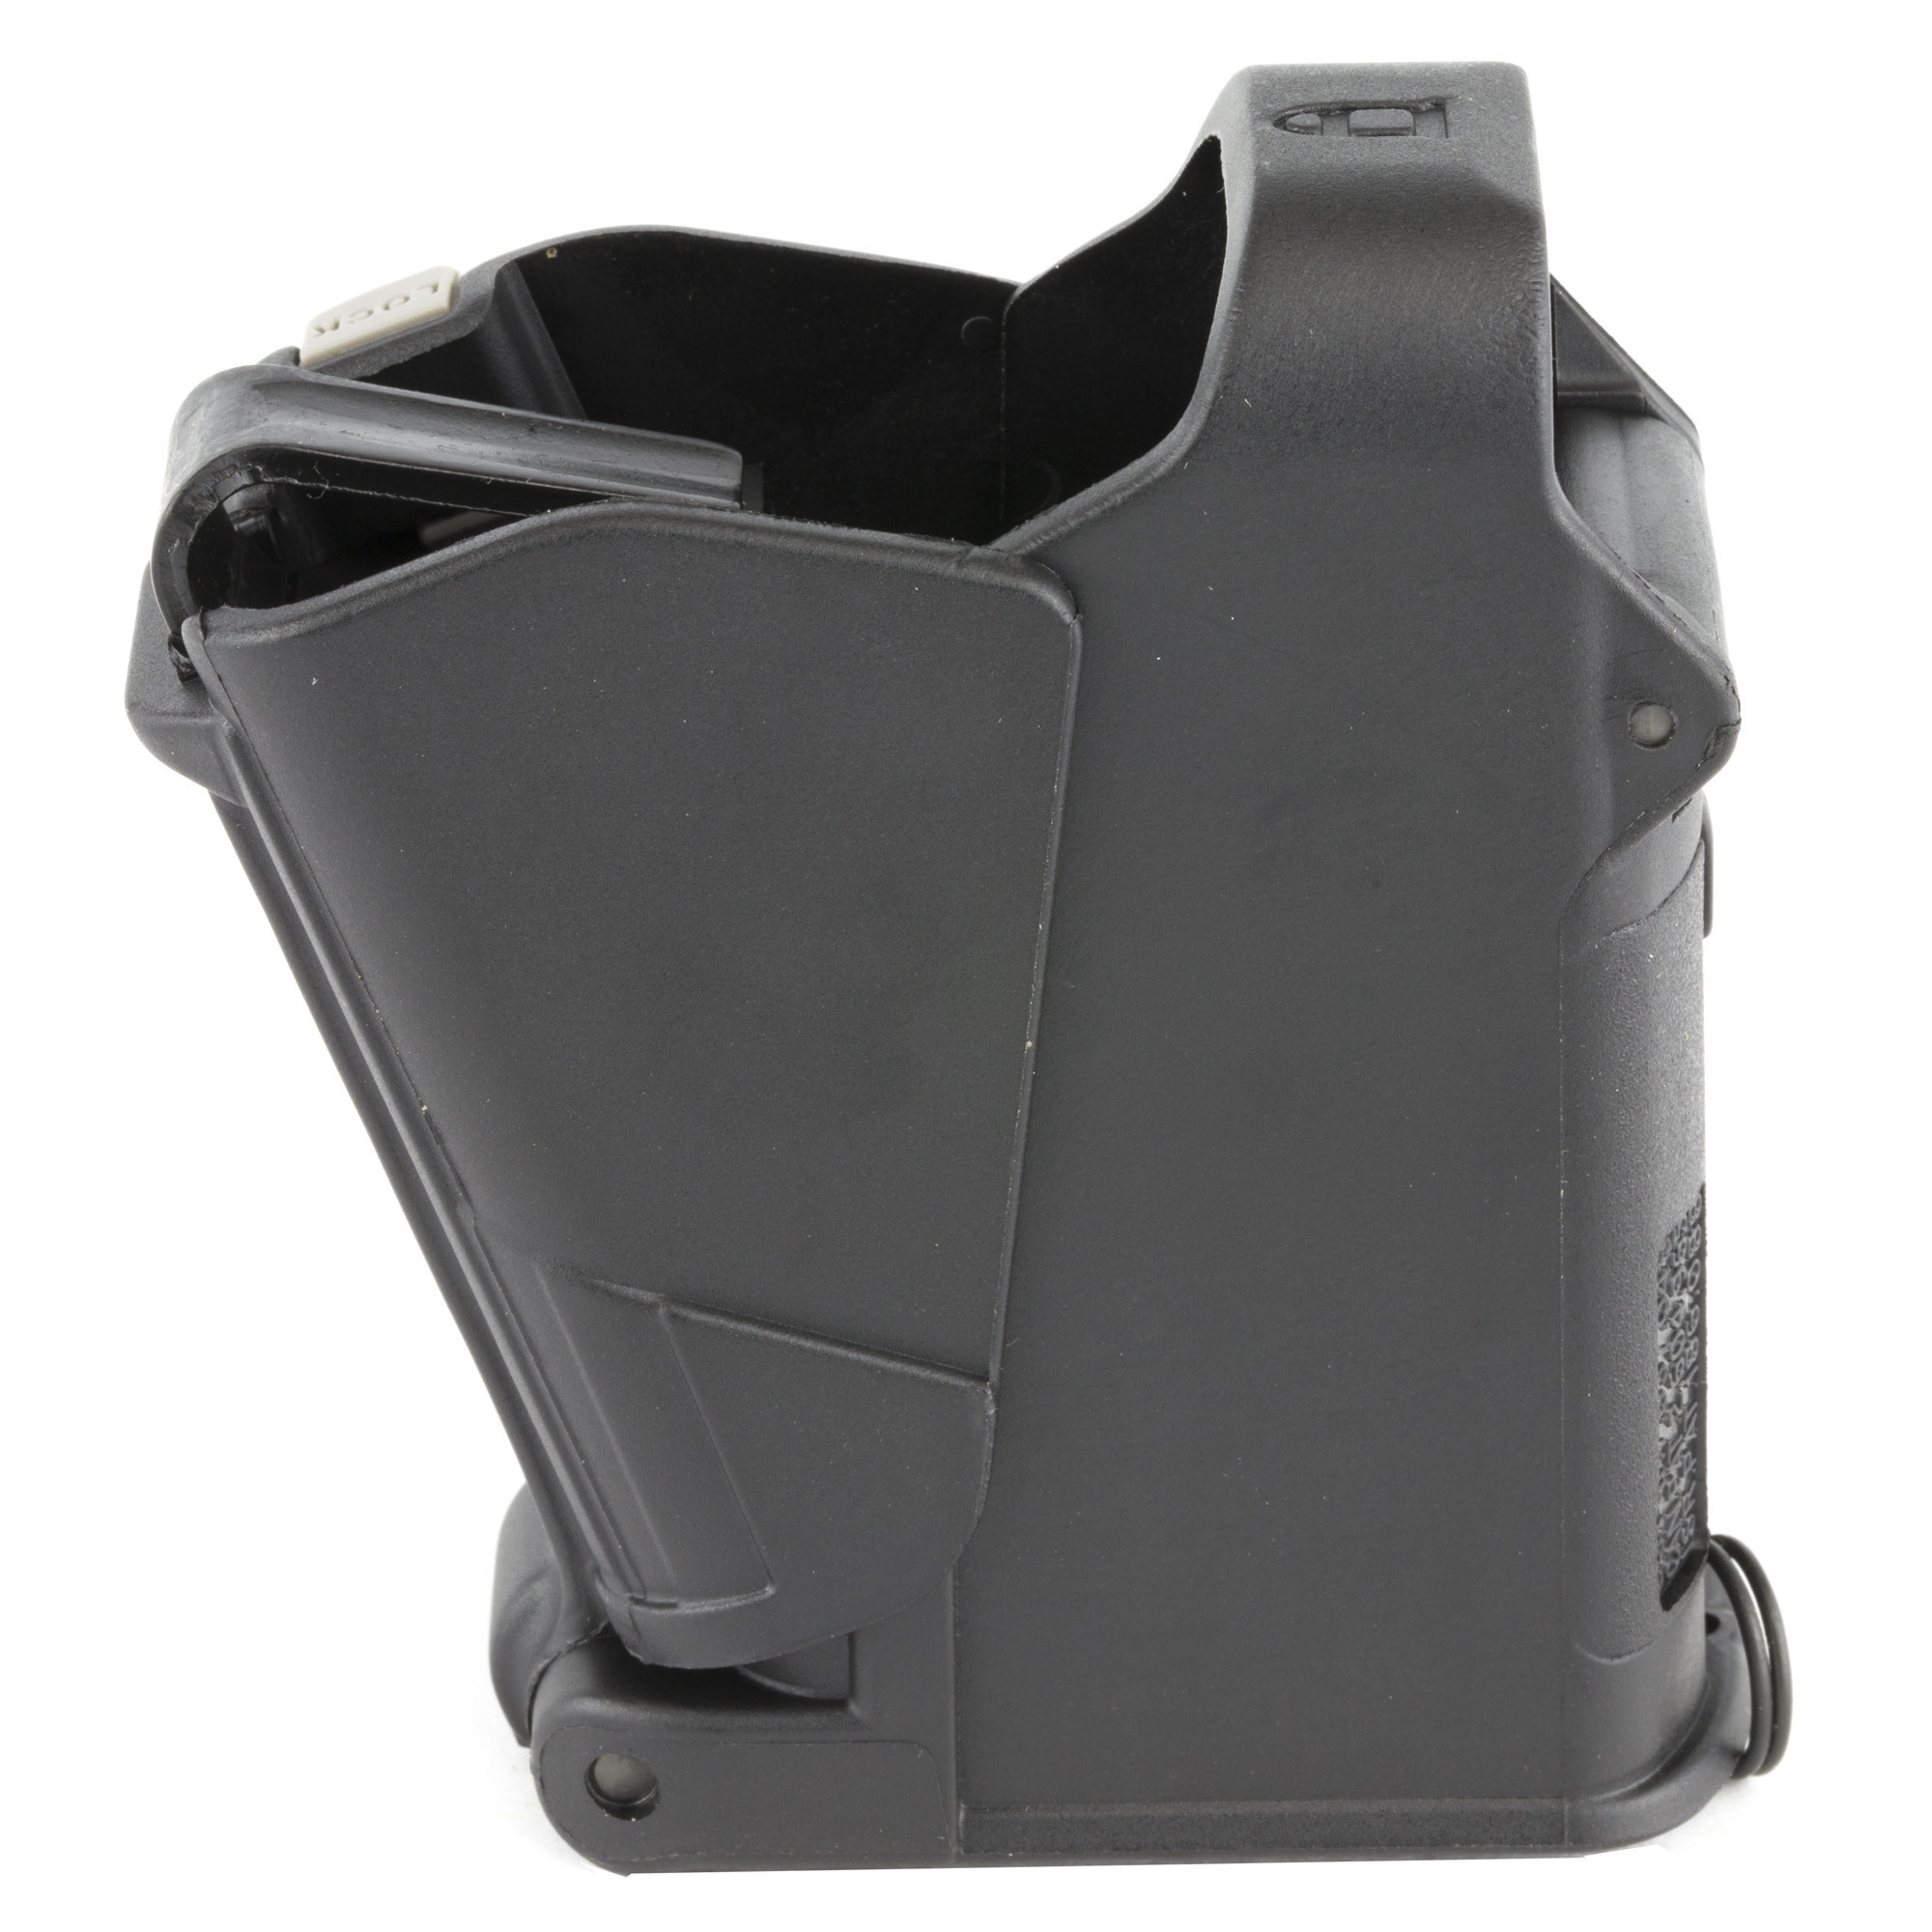 Maglula ltd. UpLula Magazine Loader/Unloader Fits 9mm-45 ACP Black